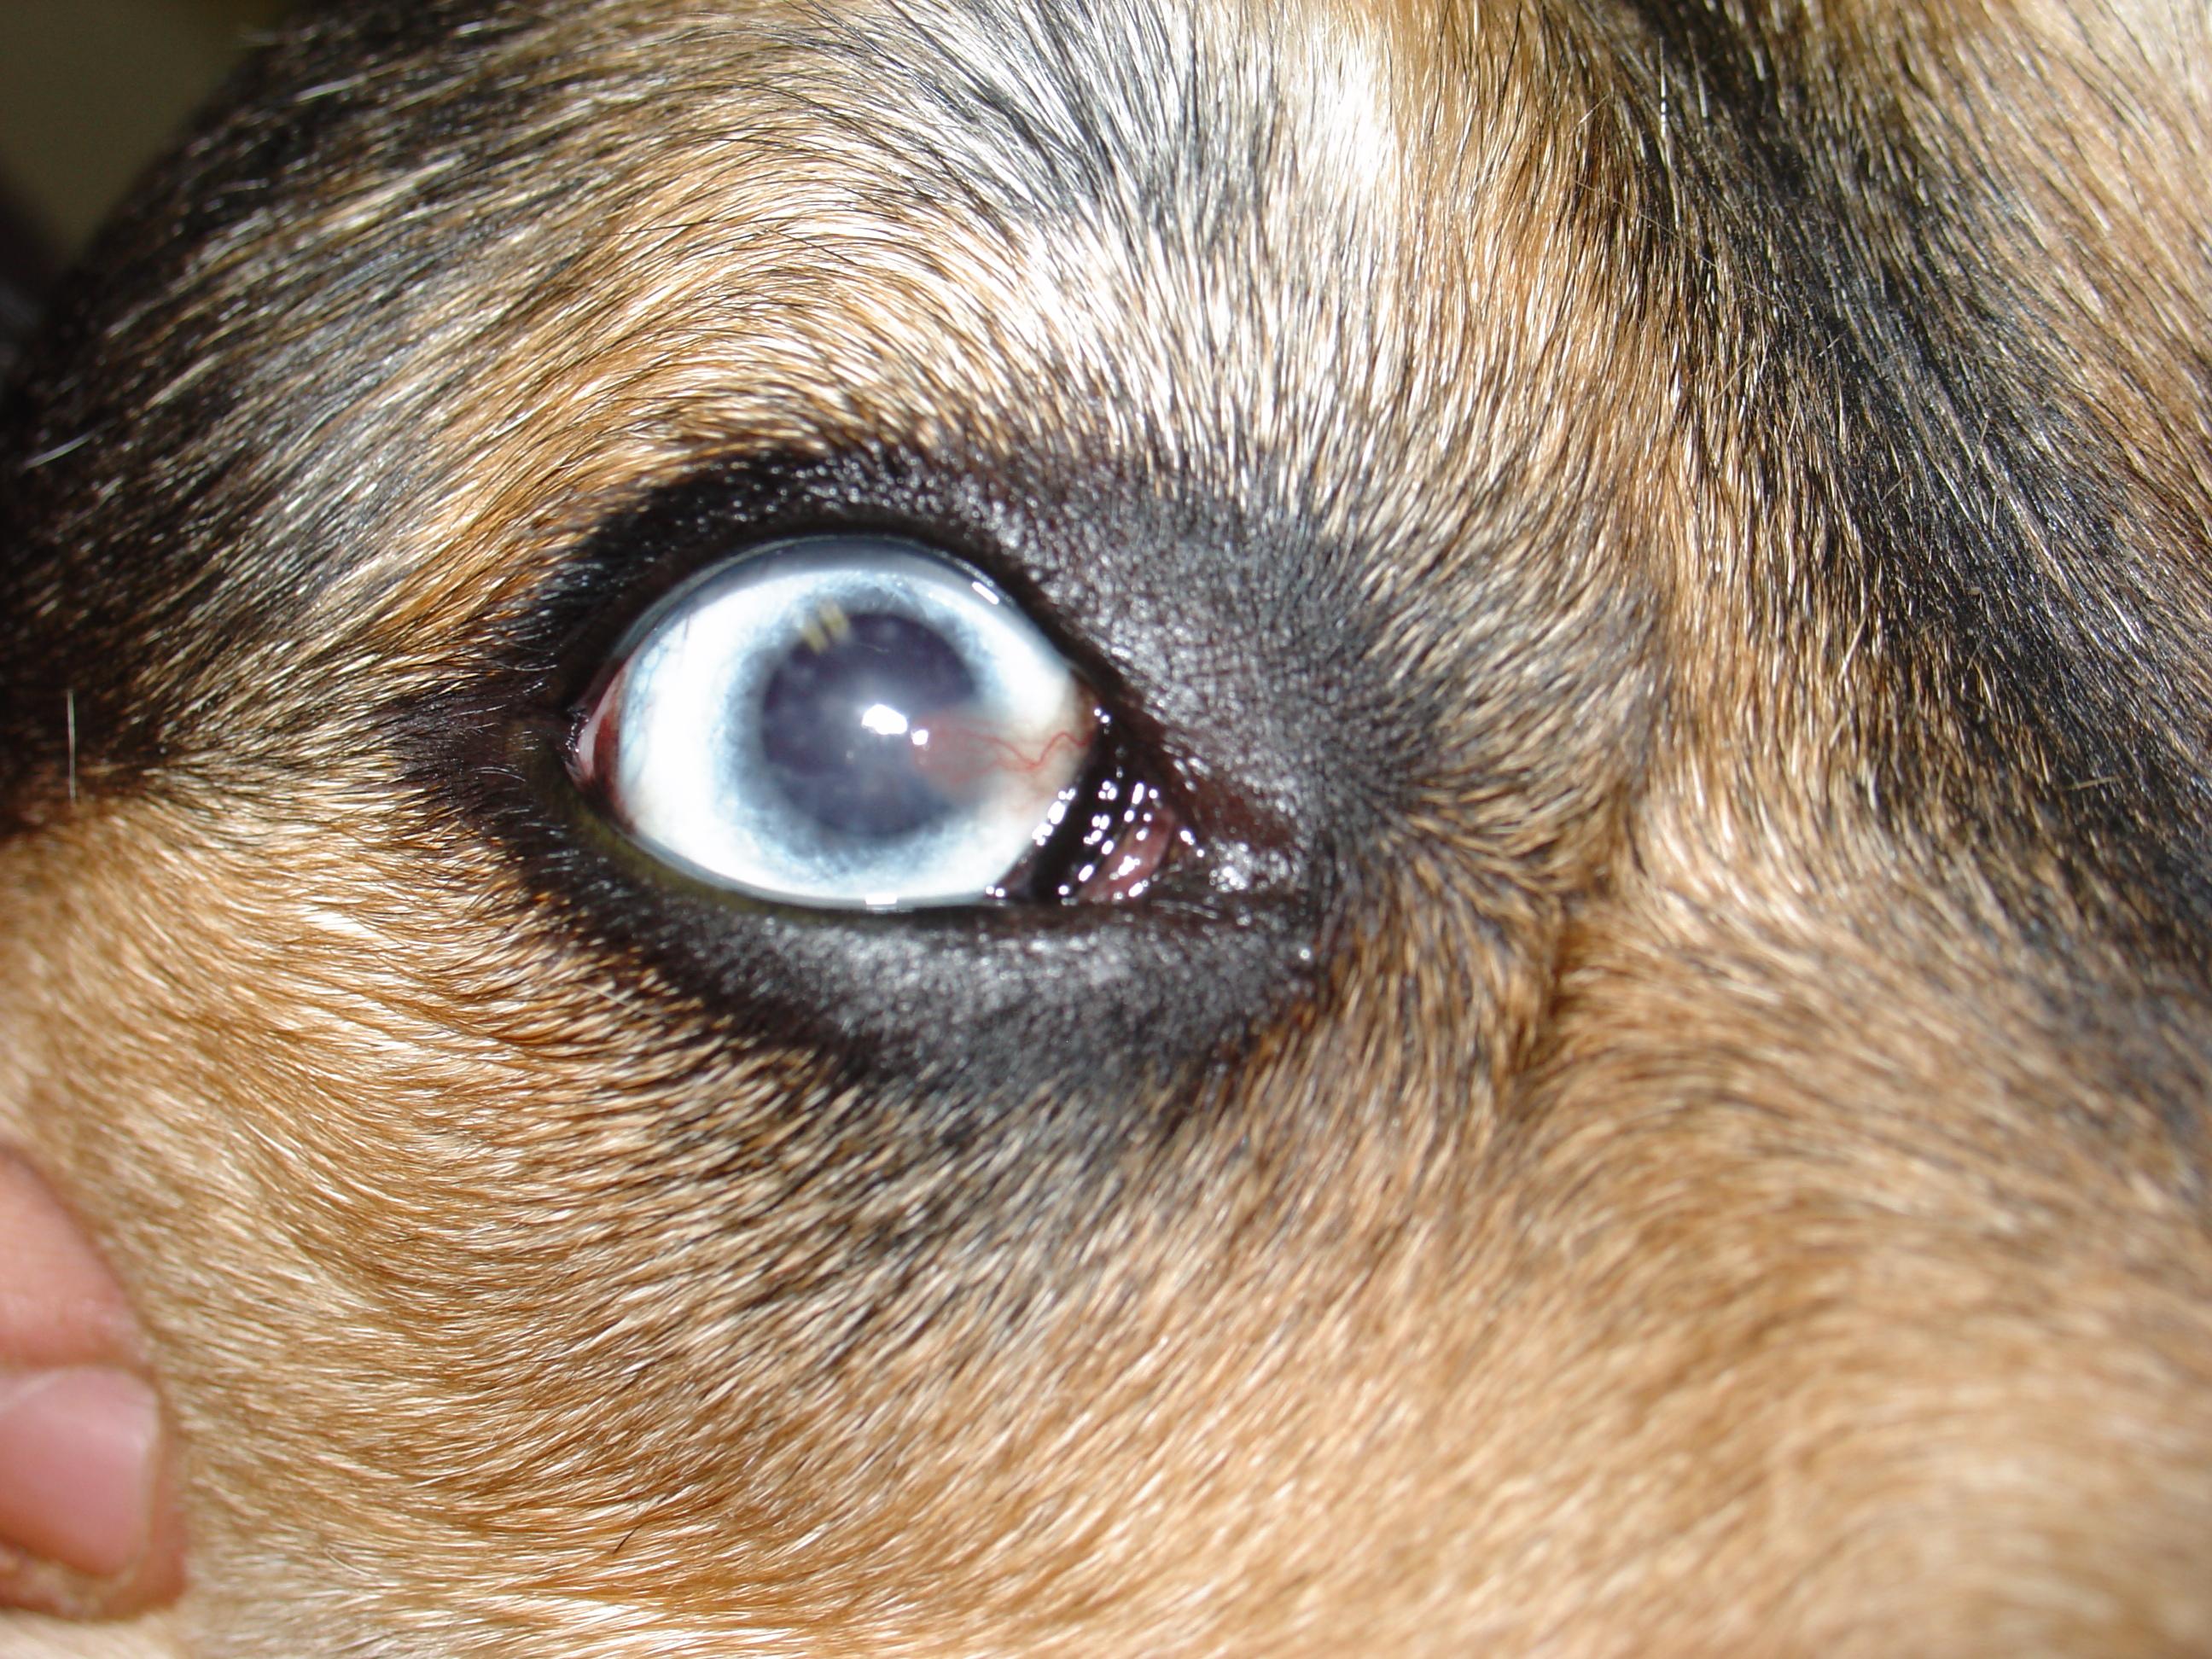 File:Canine pannus.JPG - Wikipedia